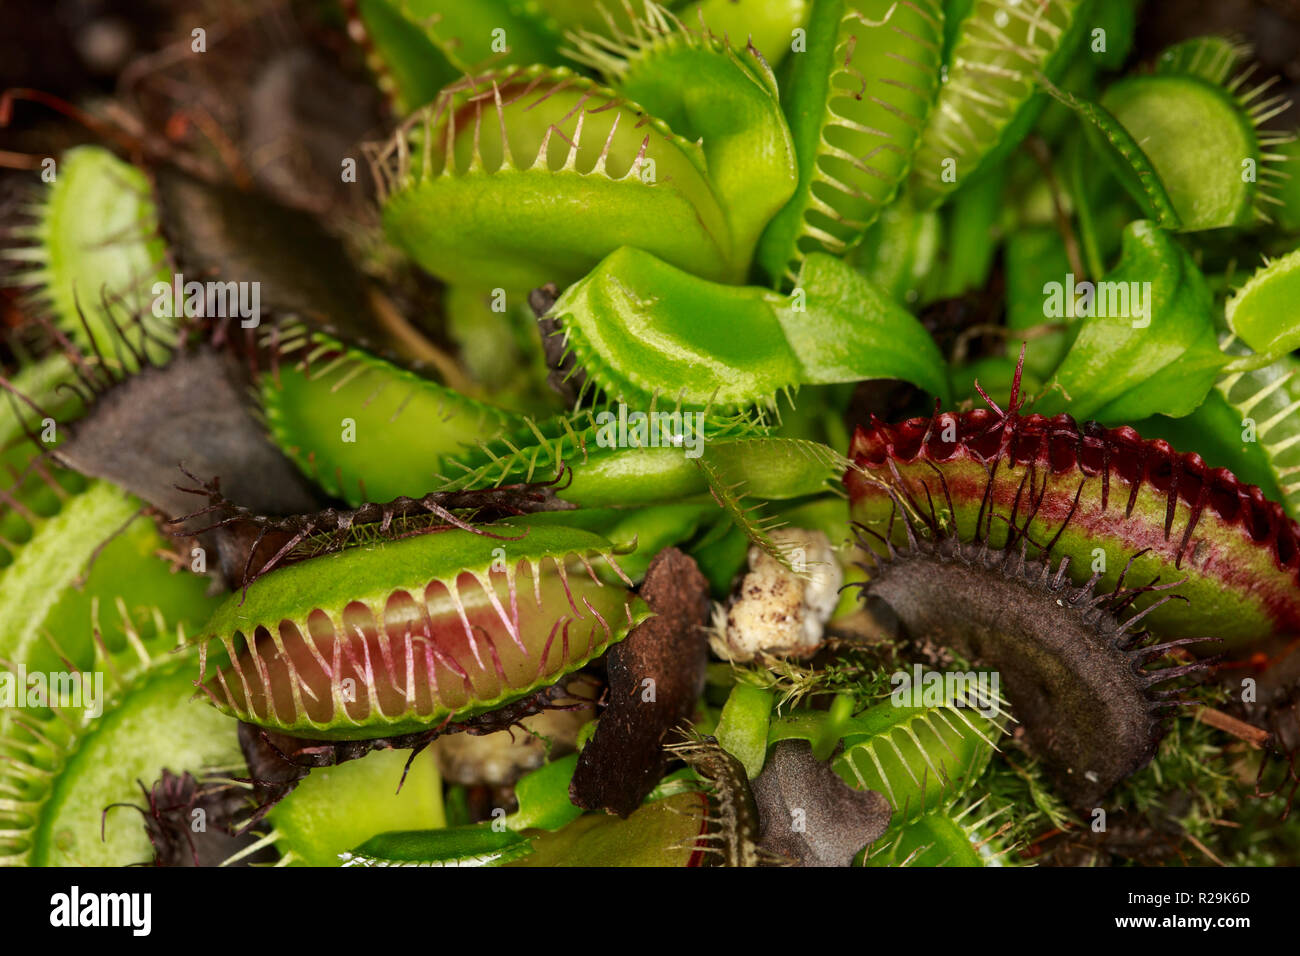 Venus fly trap (Dionaea muscipula) - Stock Image